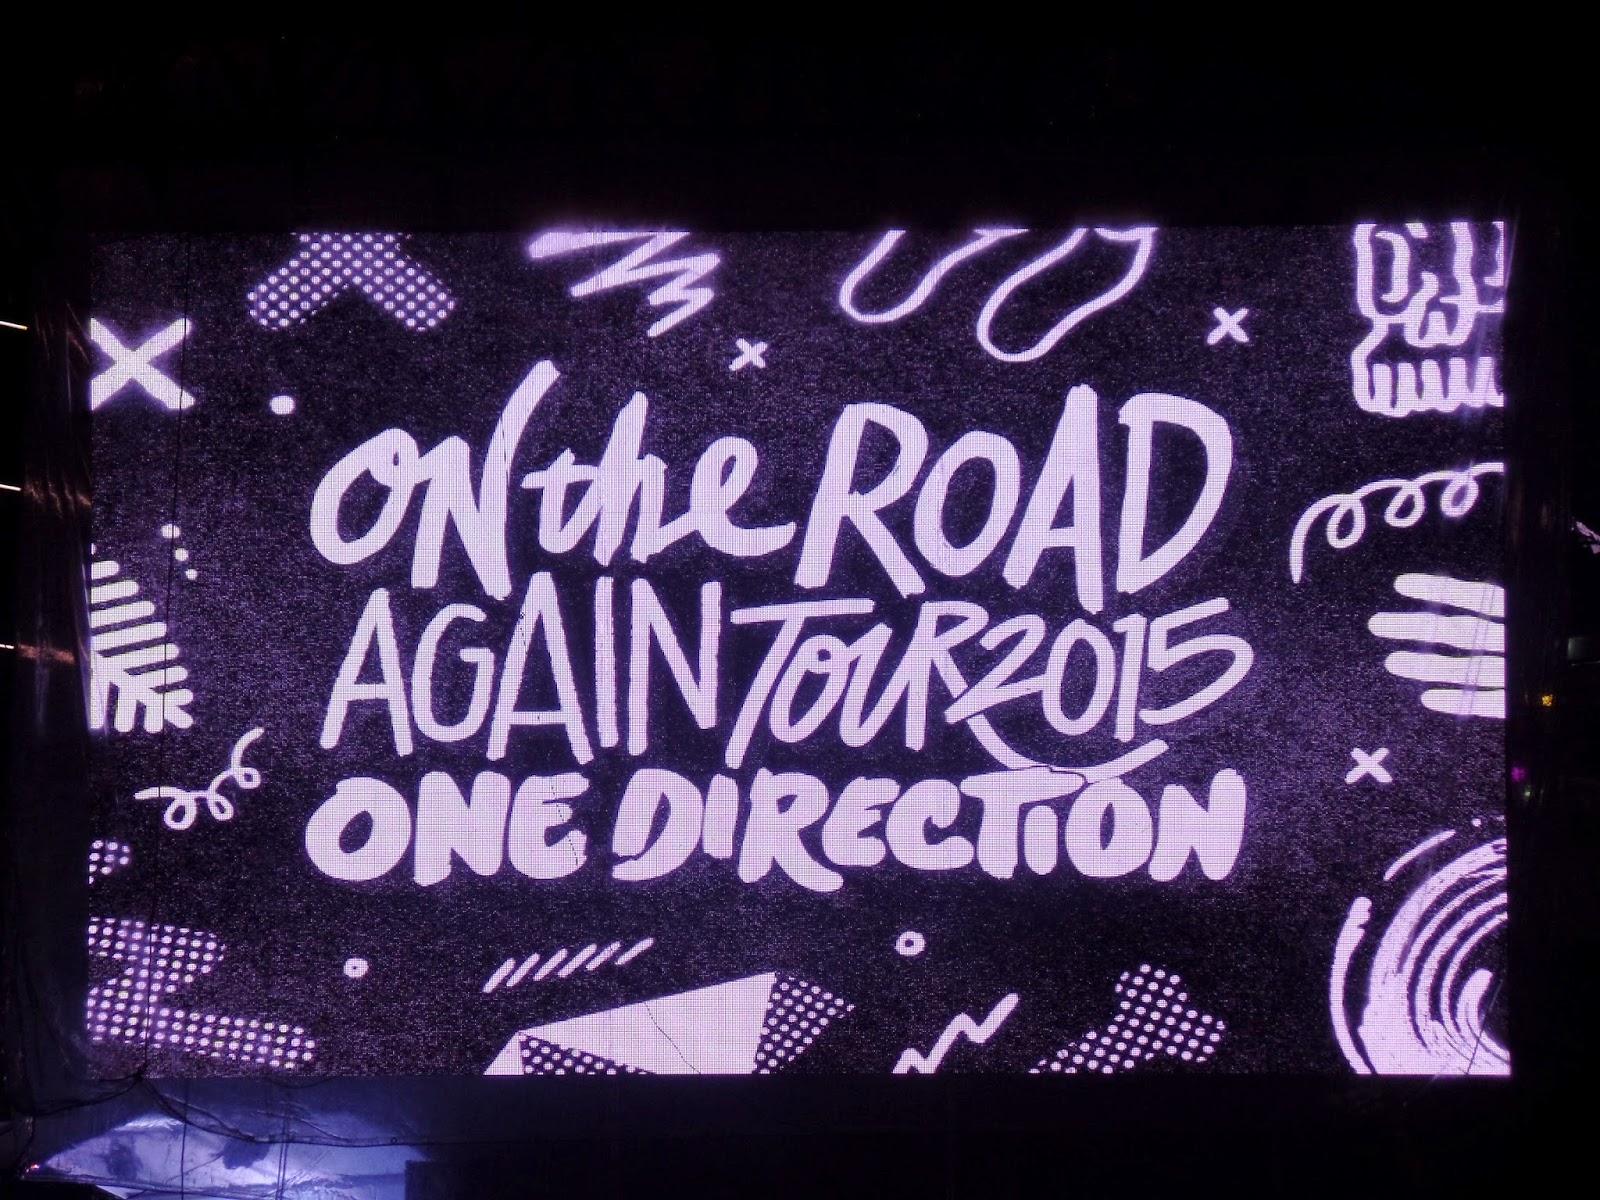 Costume Props New Kpop Got7 Light Stick Ver.2 2018 World Tour Concert Tour Lightstick Mark Jackson Led Light Stick Live Glowing Stick Good Companions For Children As Well As Adults